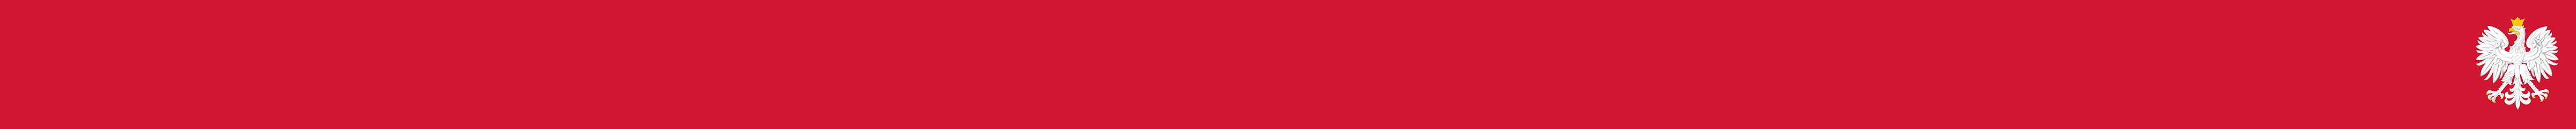 home-emblem